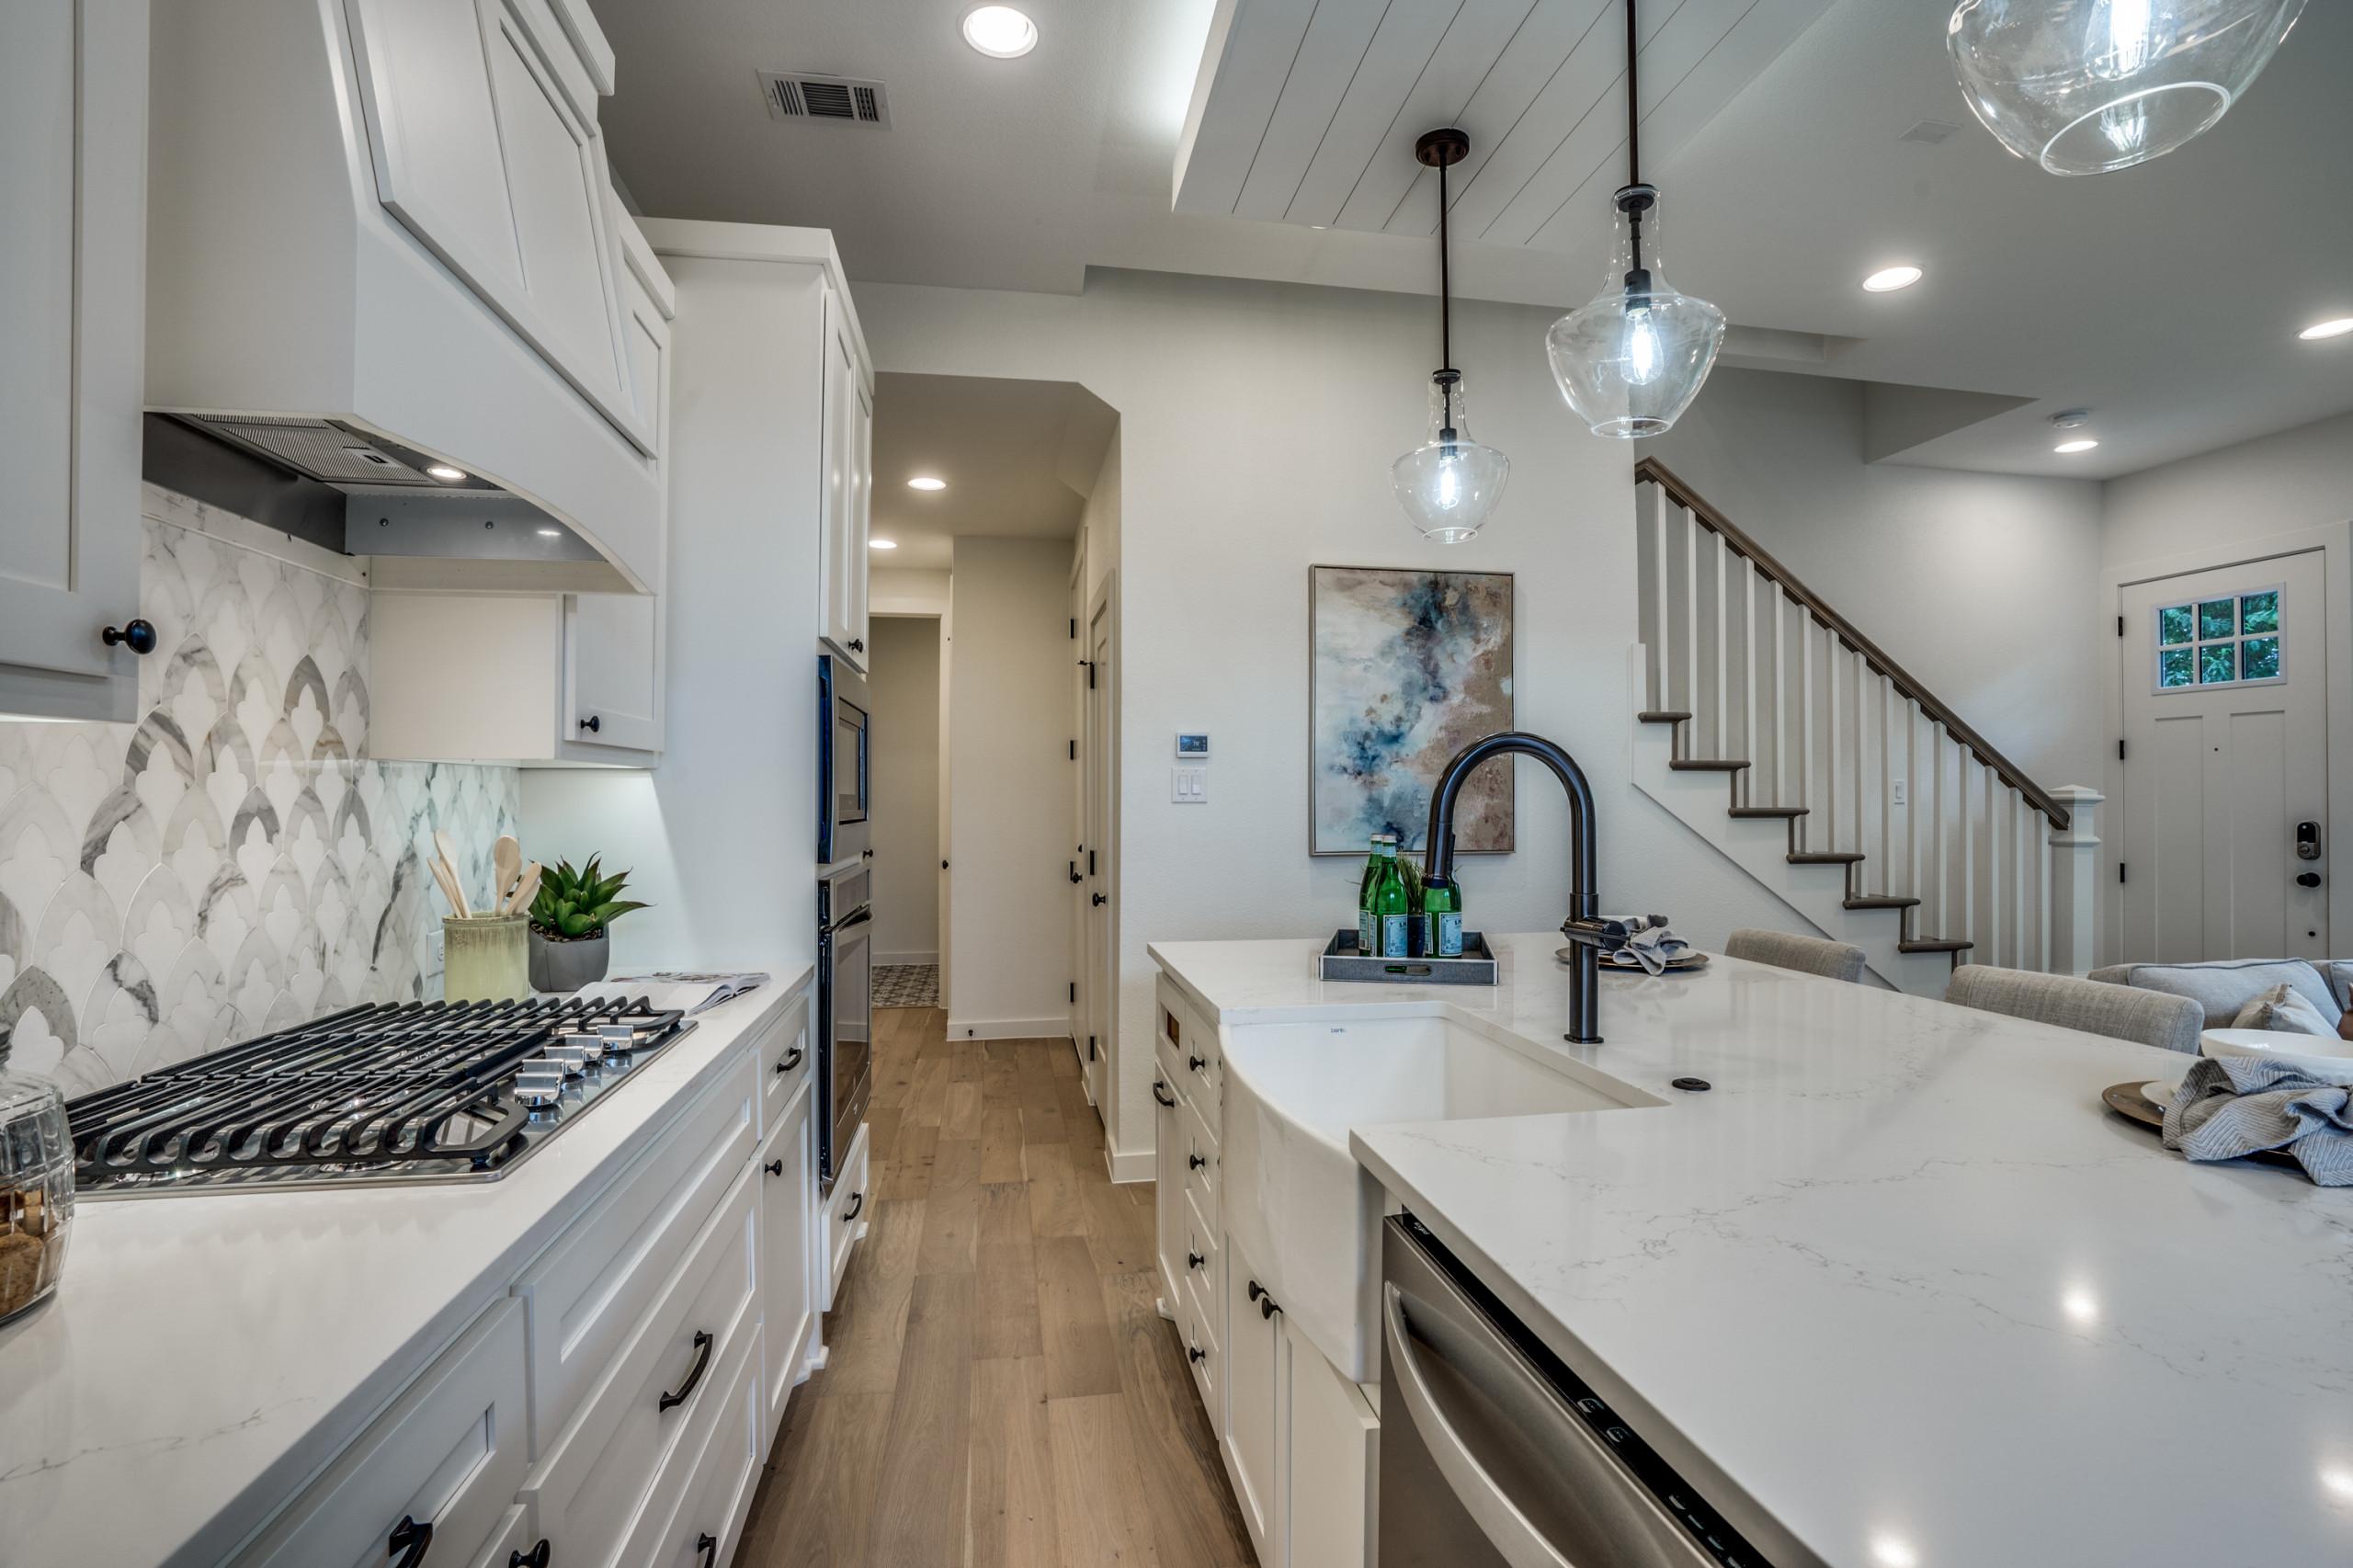 Kitchen Backsplash and Countertops